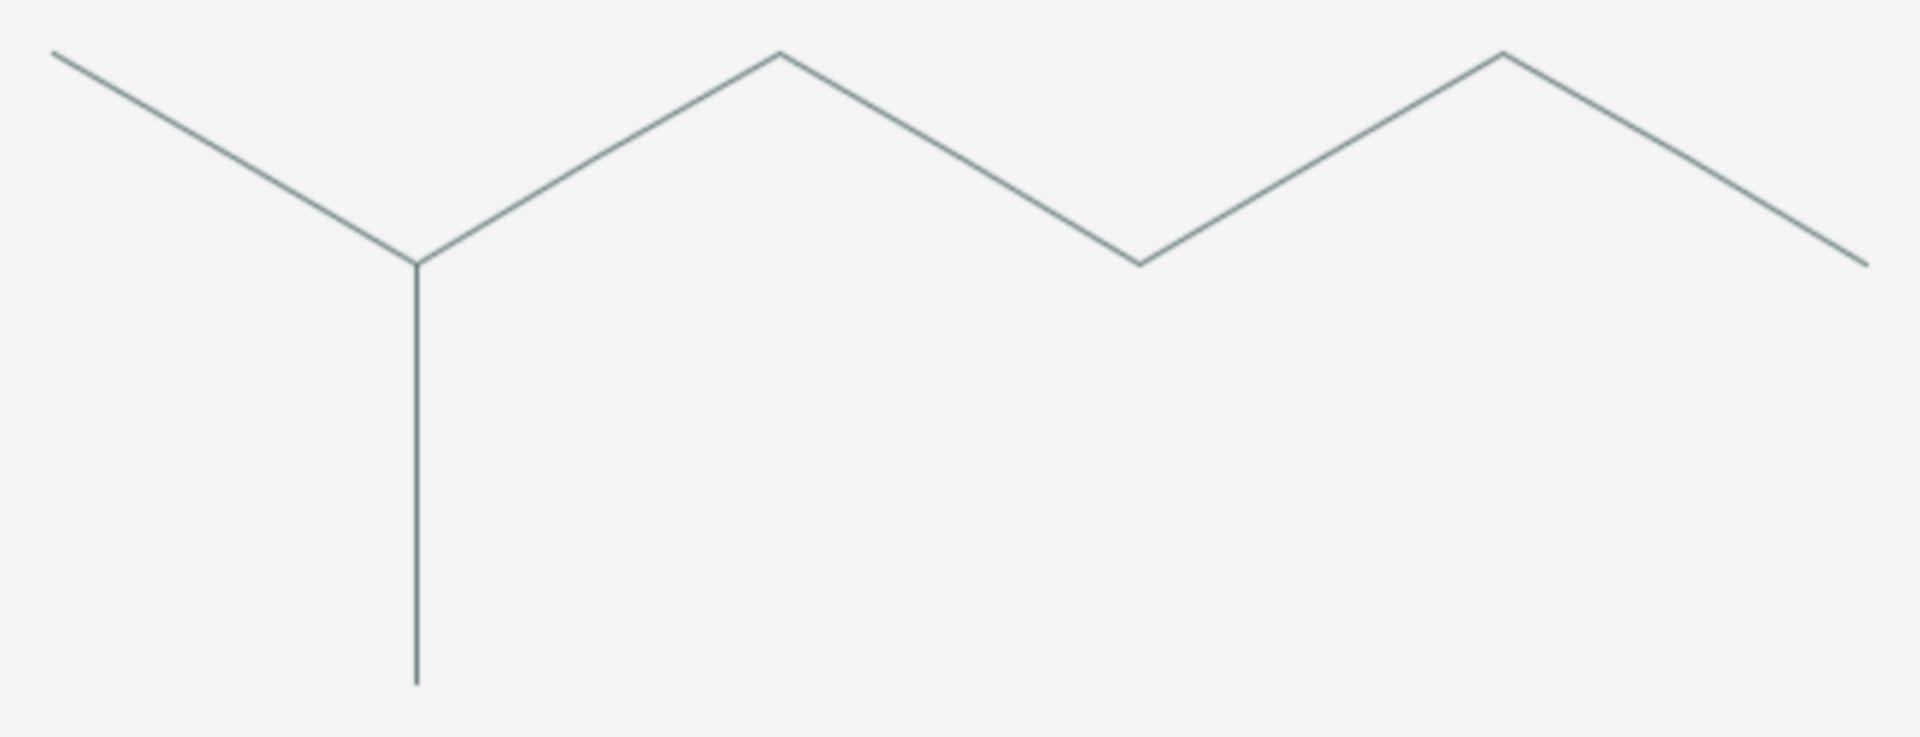 2-Methylhexan (Strukturformel)